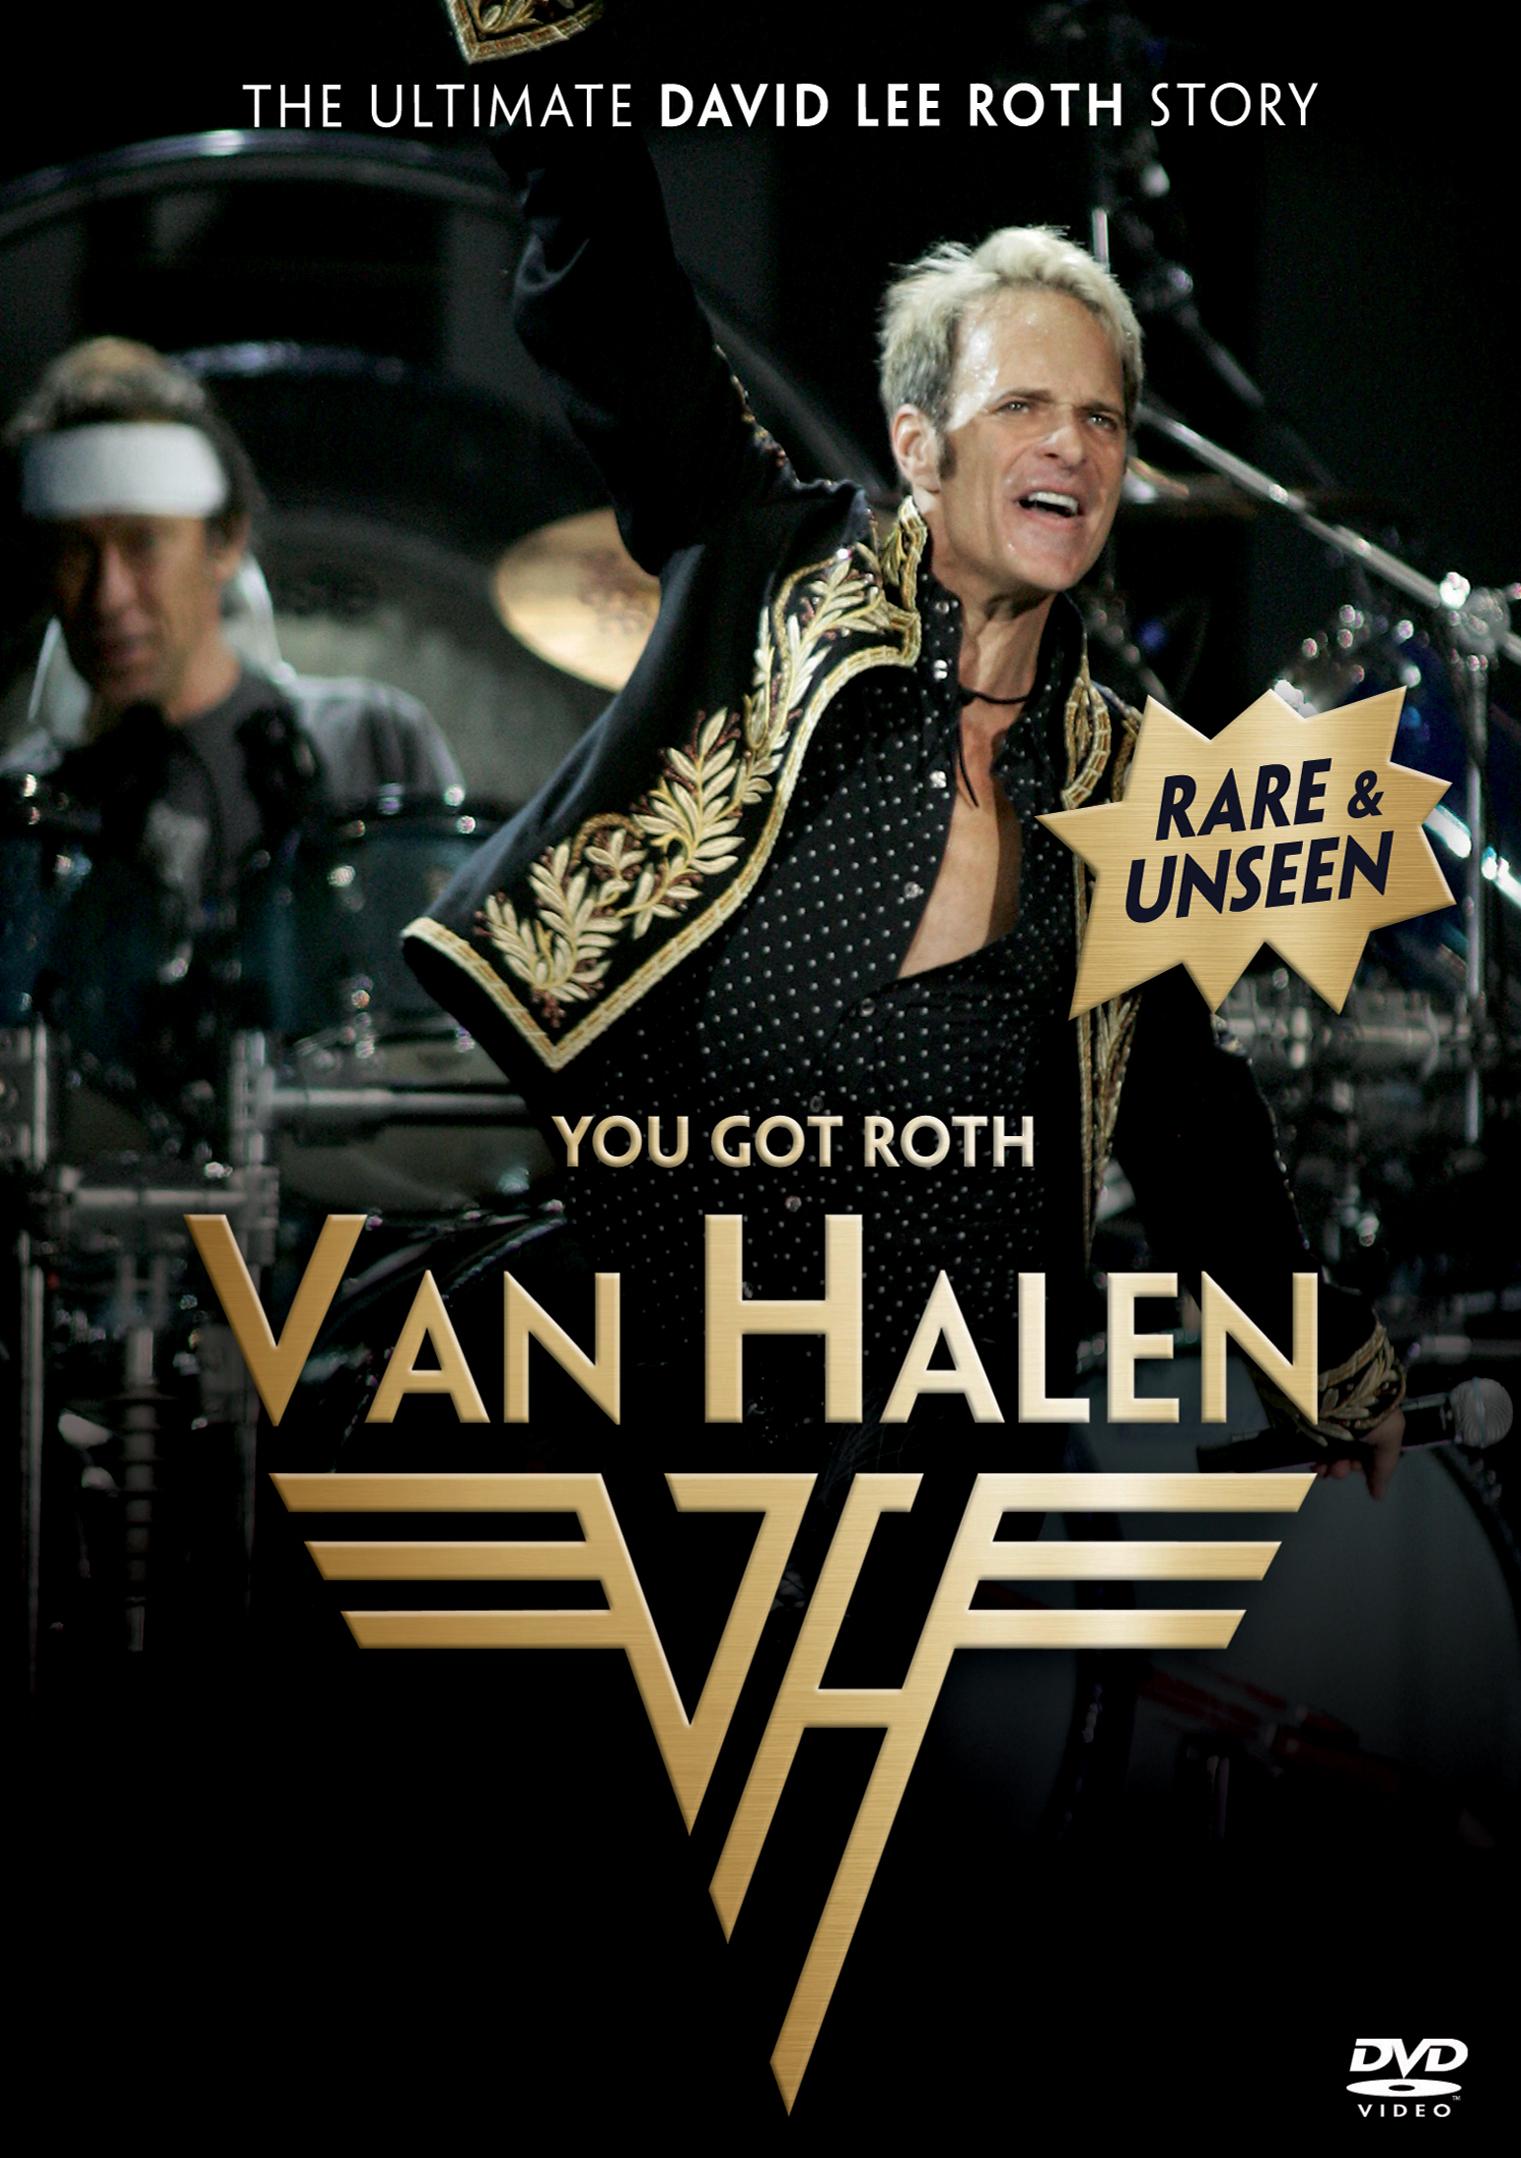 Van Halen: You Got Roth - The Ultimate David Lee Roth Story